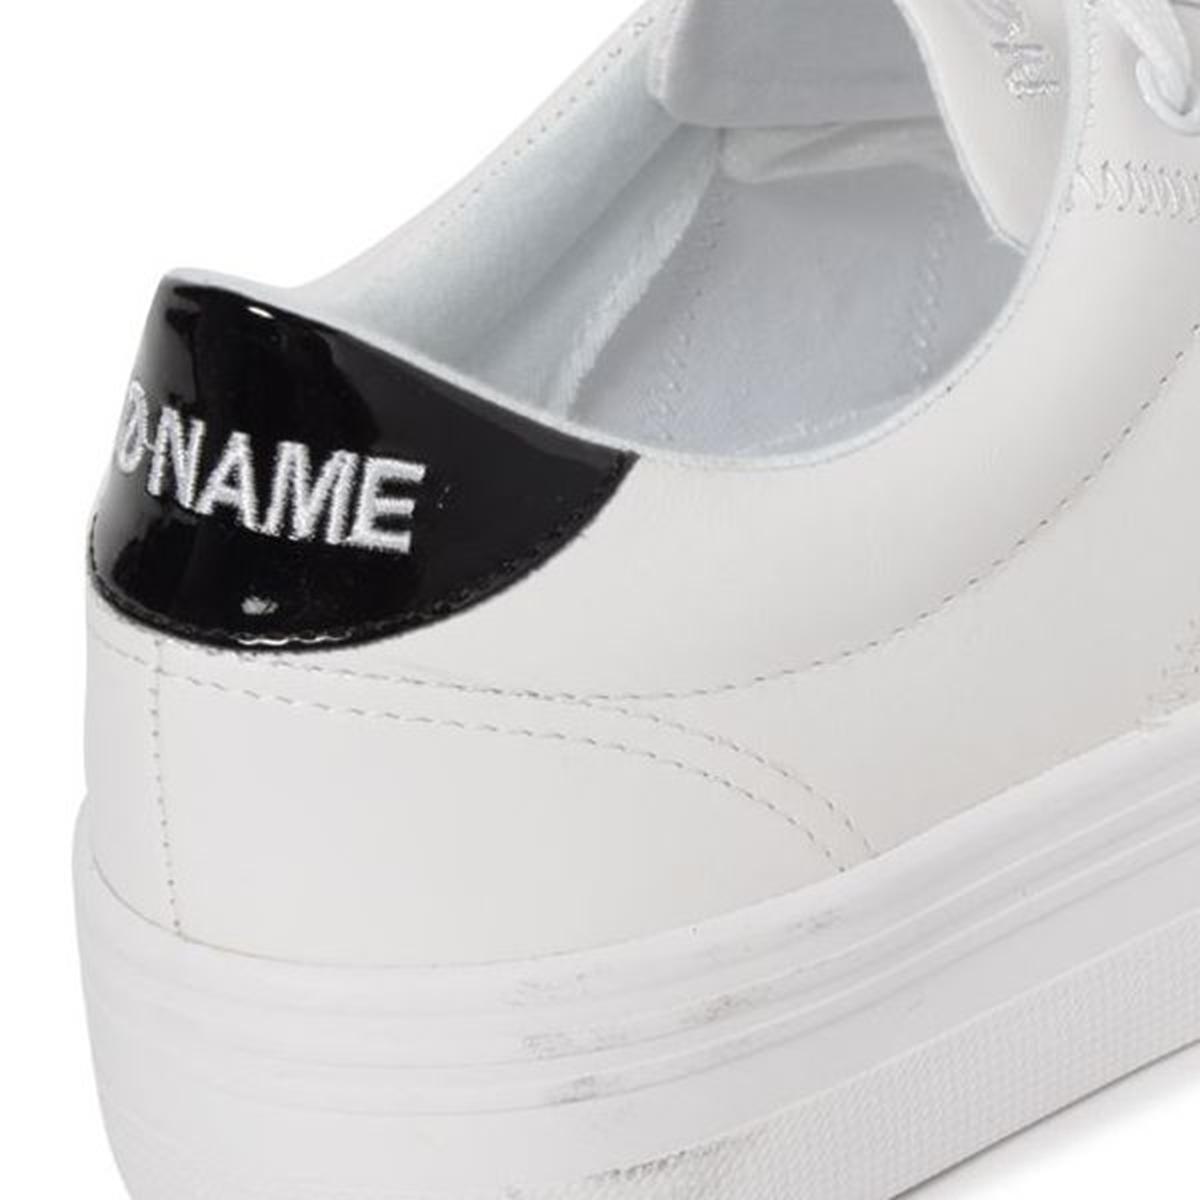 PLATO-11150-WHITE プラト ホワイト